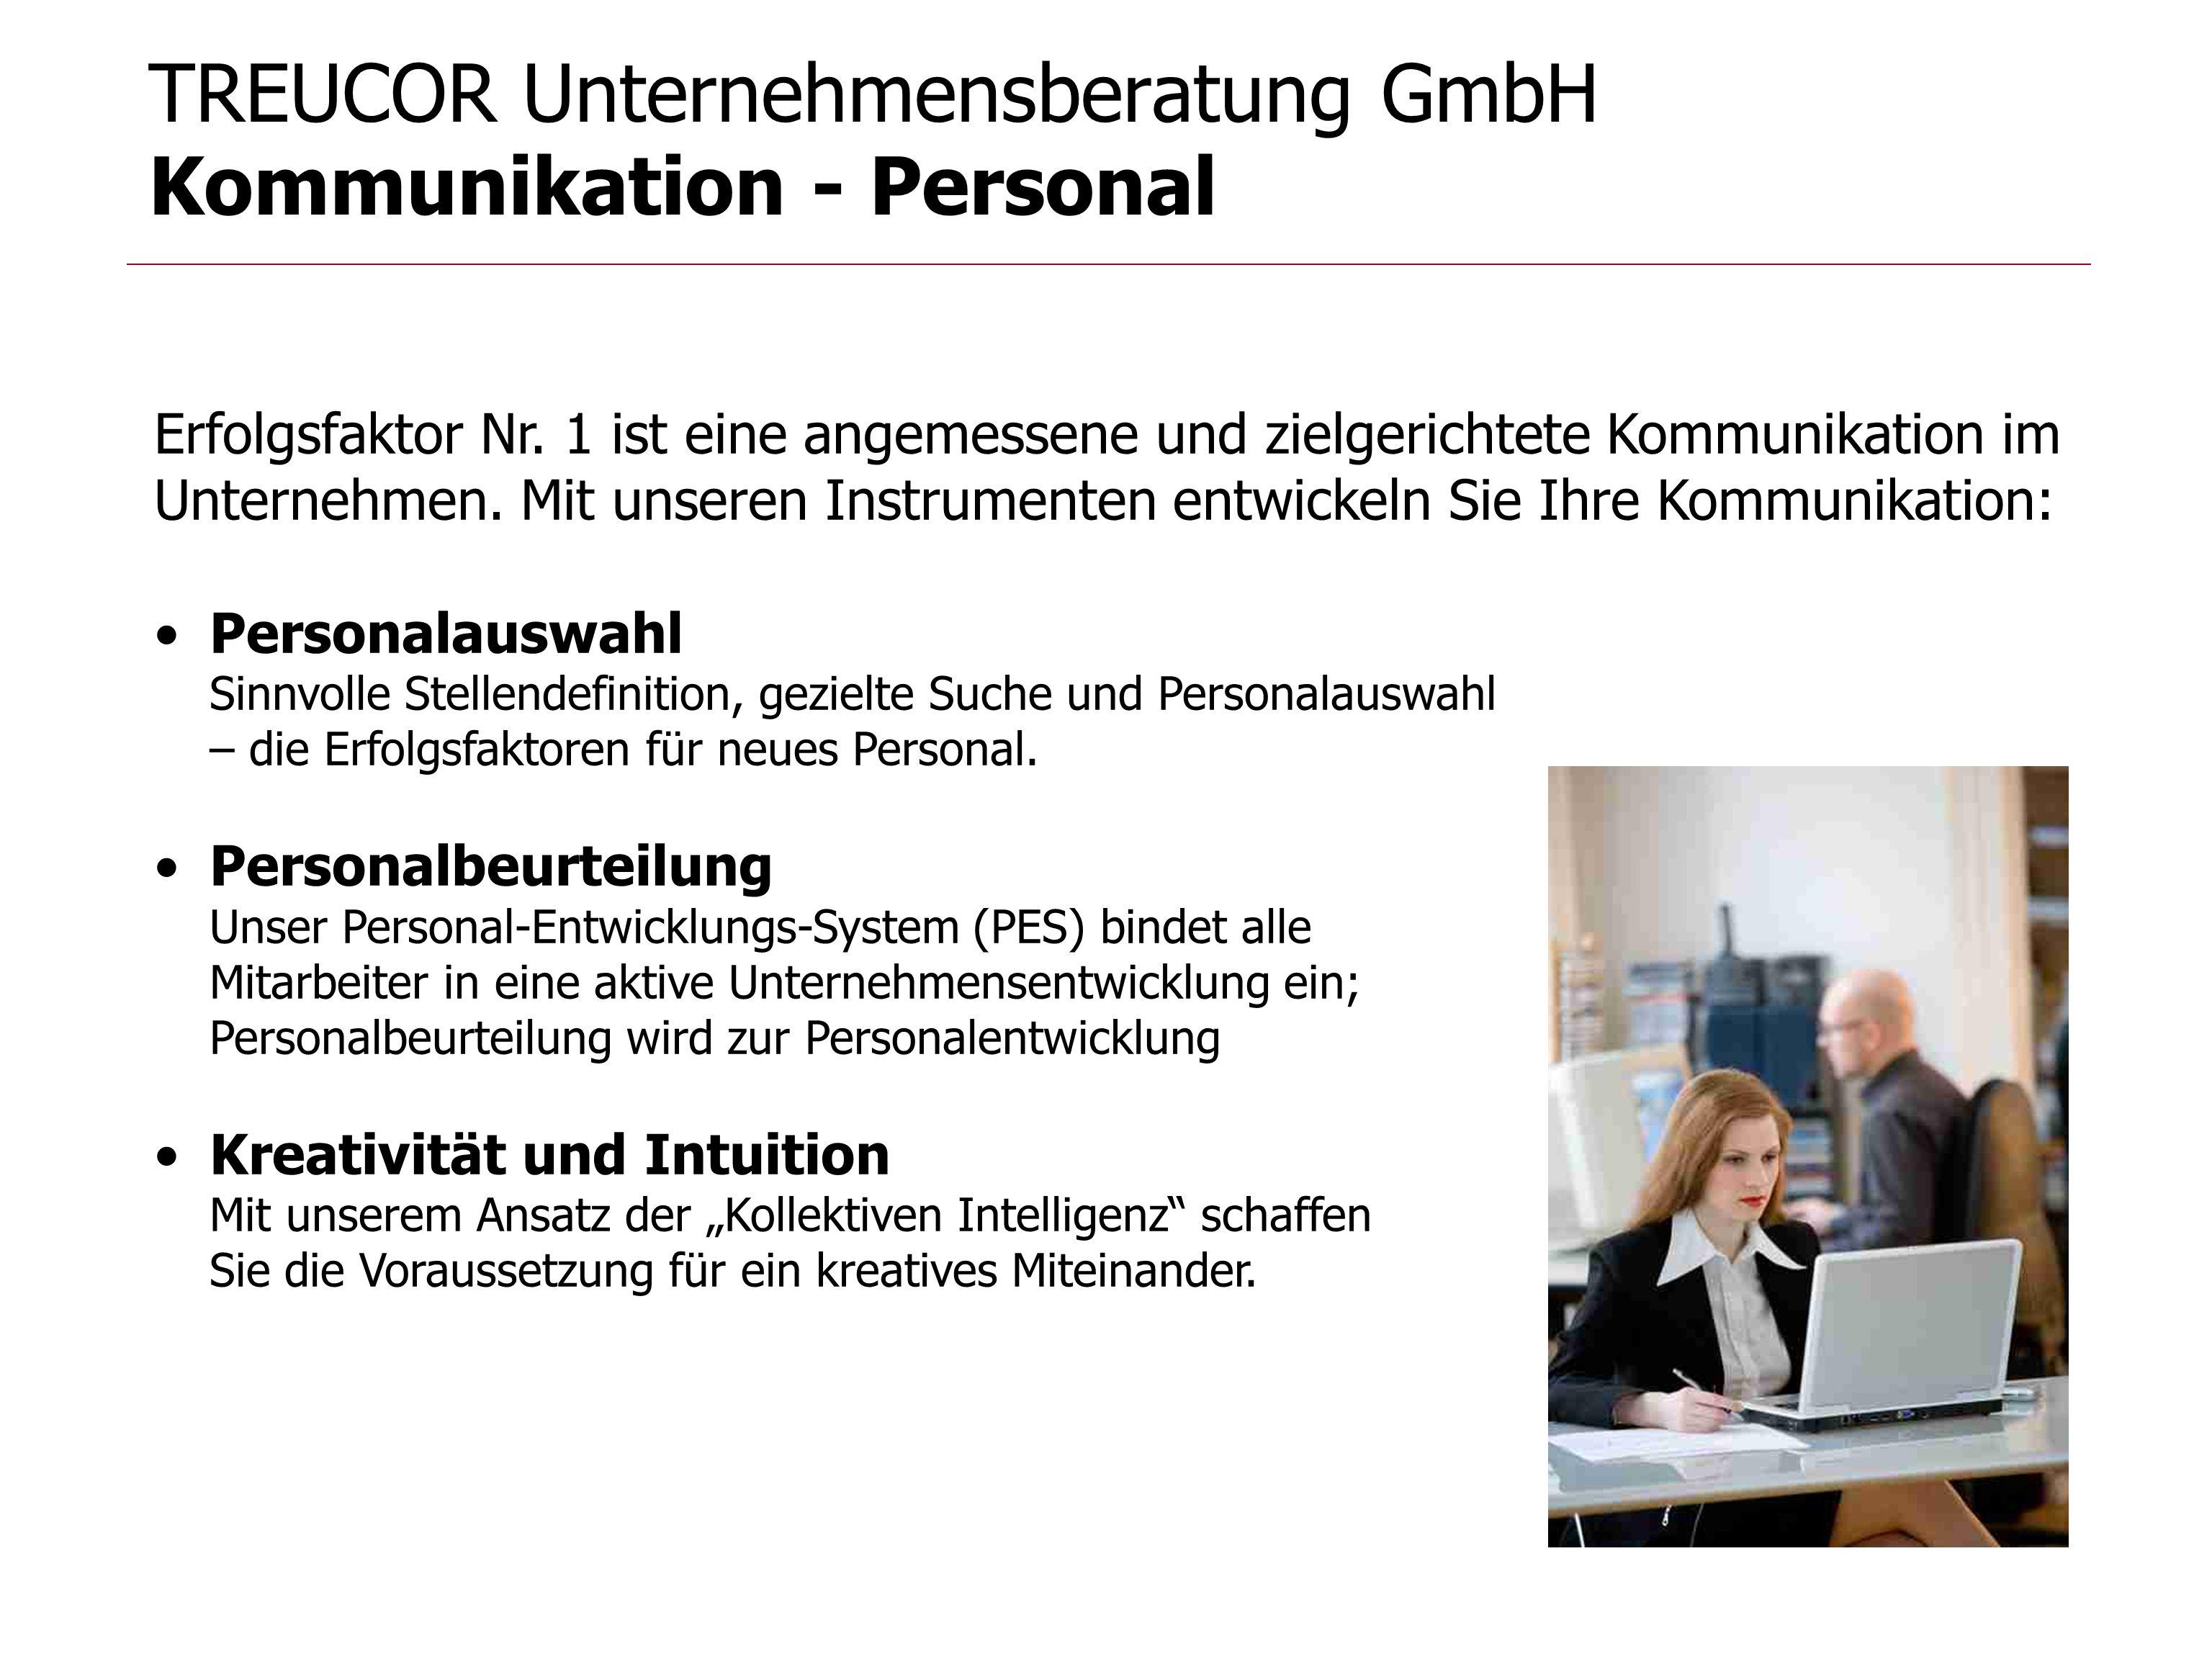 TREUCOR Unternehmensberatung GmbH Kommunikation - Personal Erfolgsfaktor Nr. 1 ist eine angemessene und zielgerichtete Kommunikation im Unternehmen. M